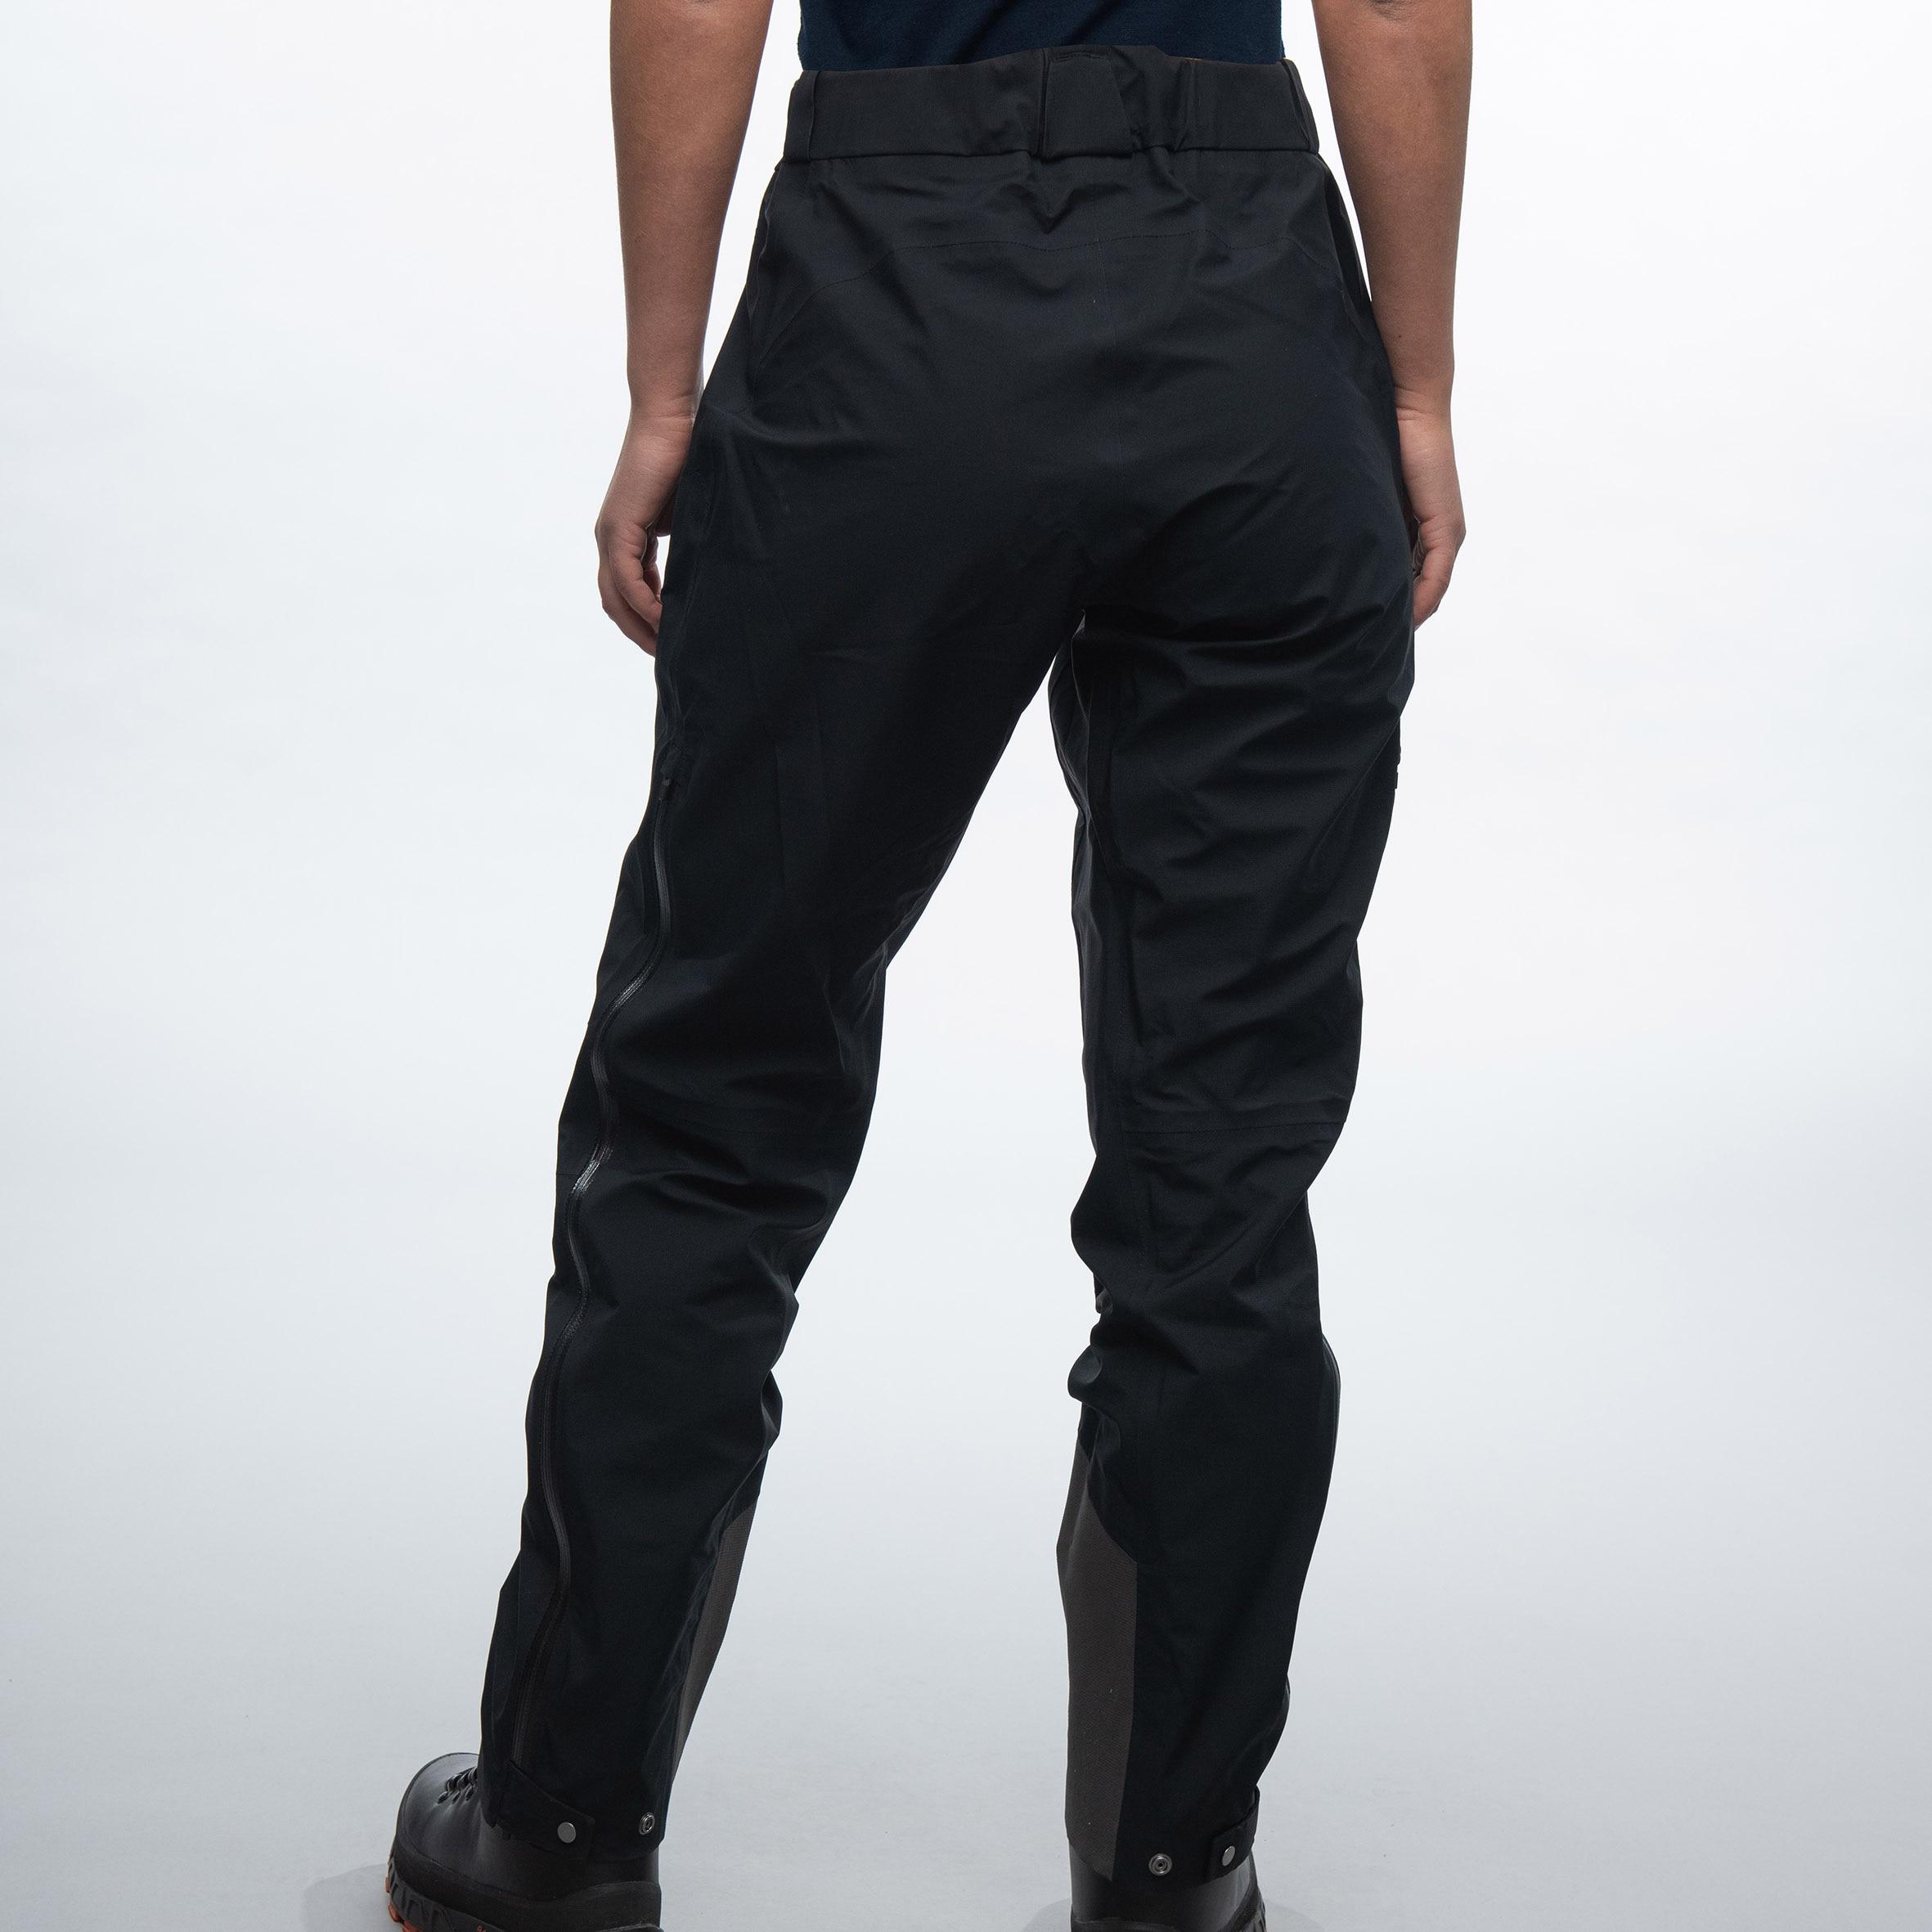 Rabot V2 3L W Pants